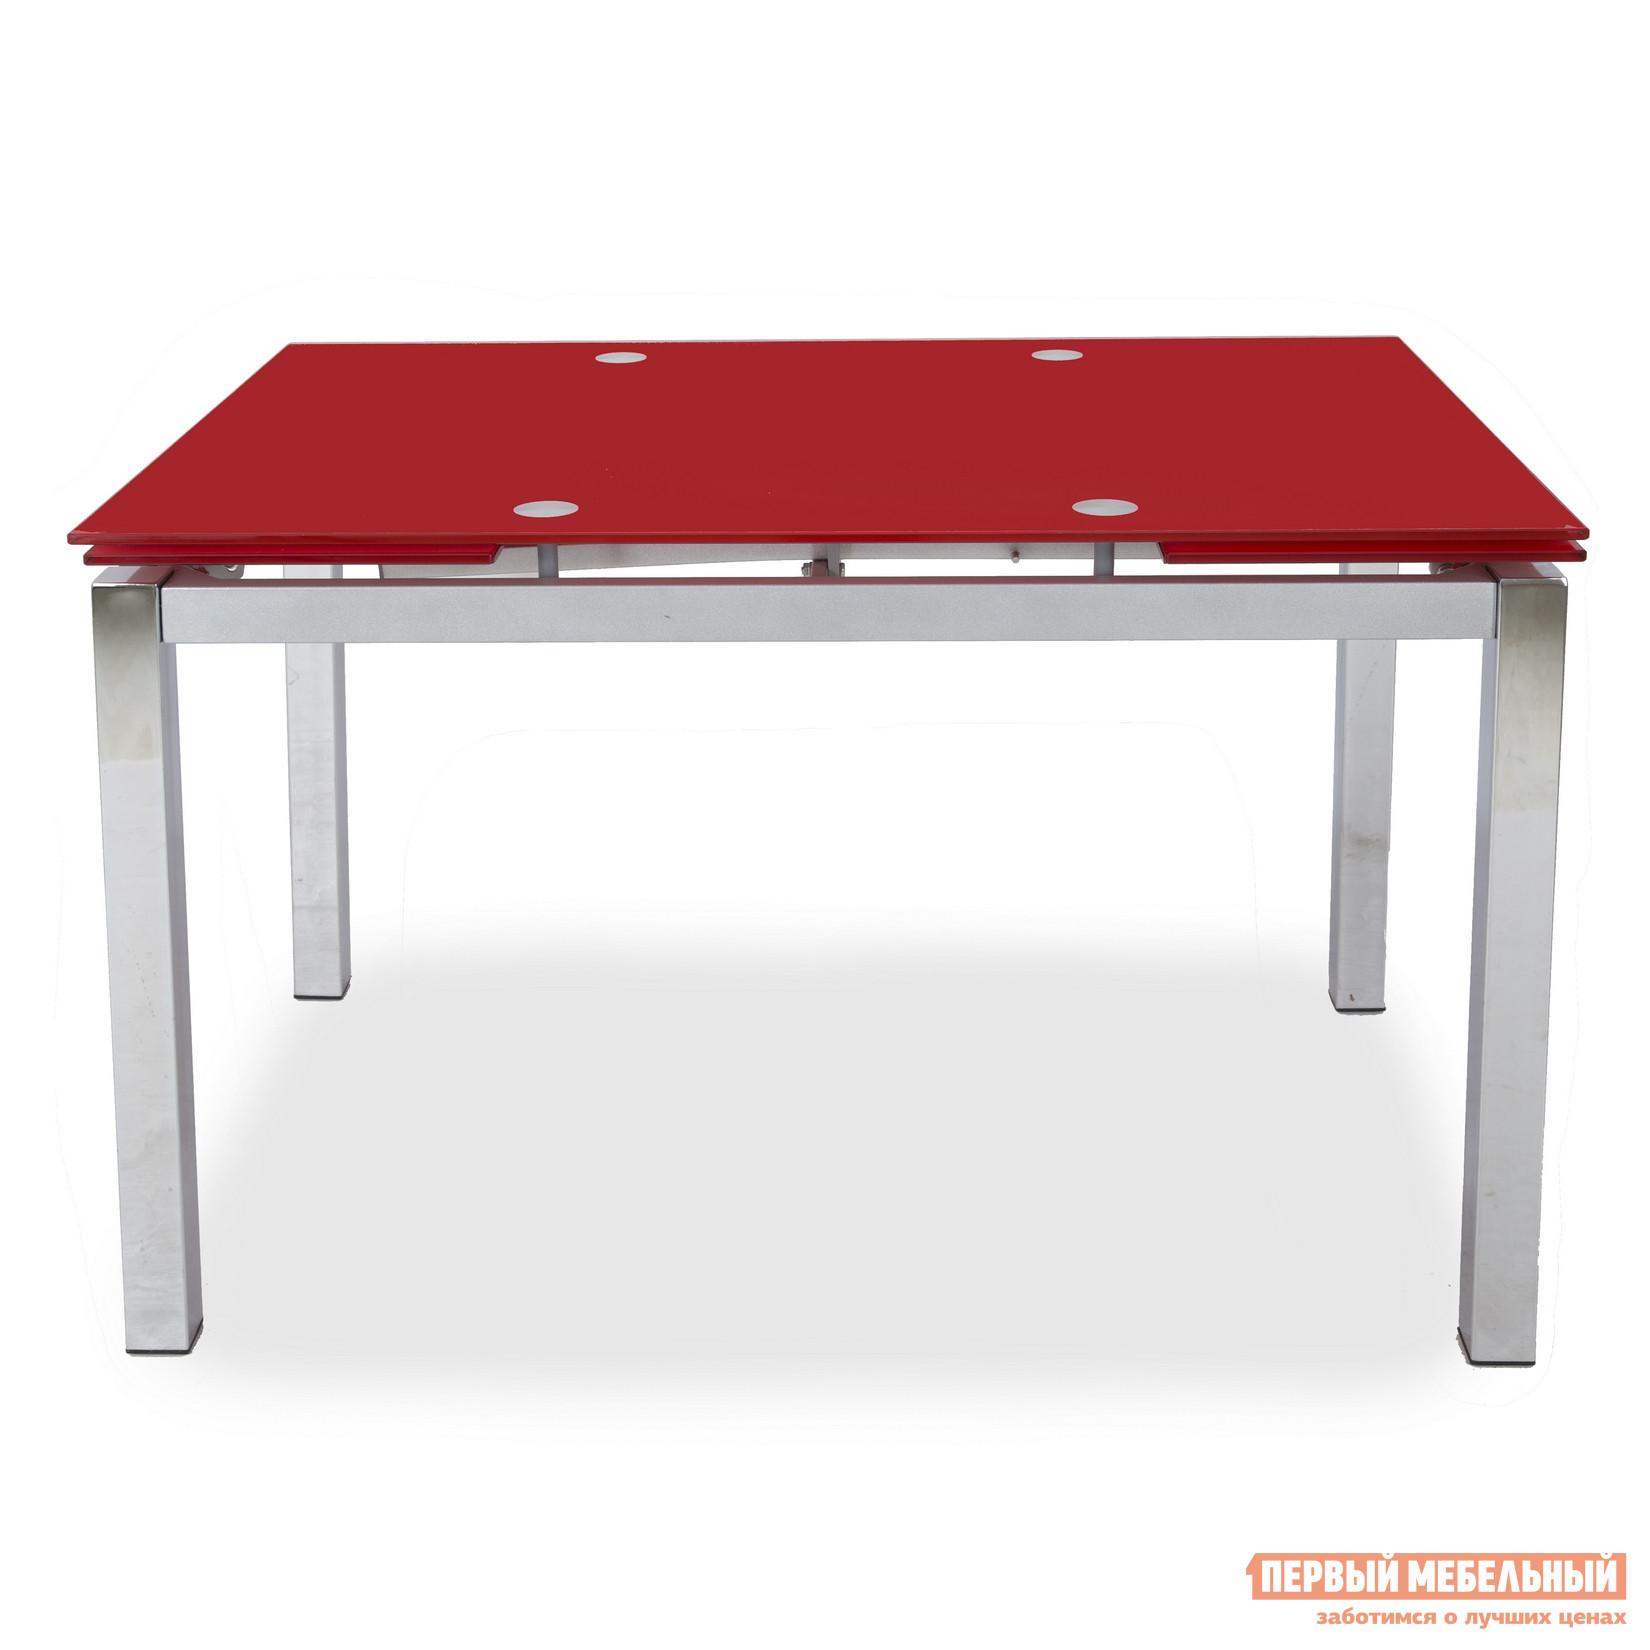 Кухонный стол Бентли Трейд S17 цена